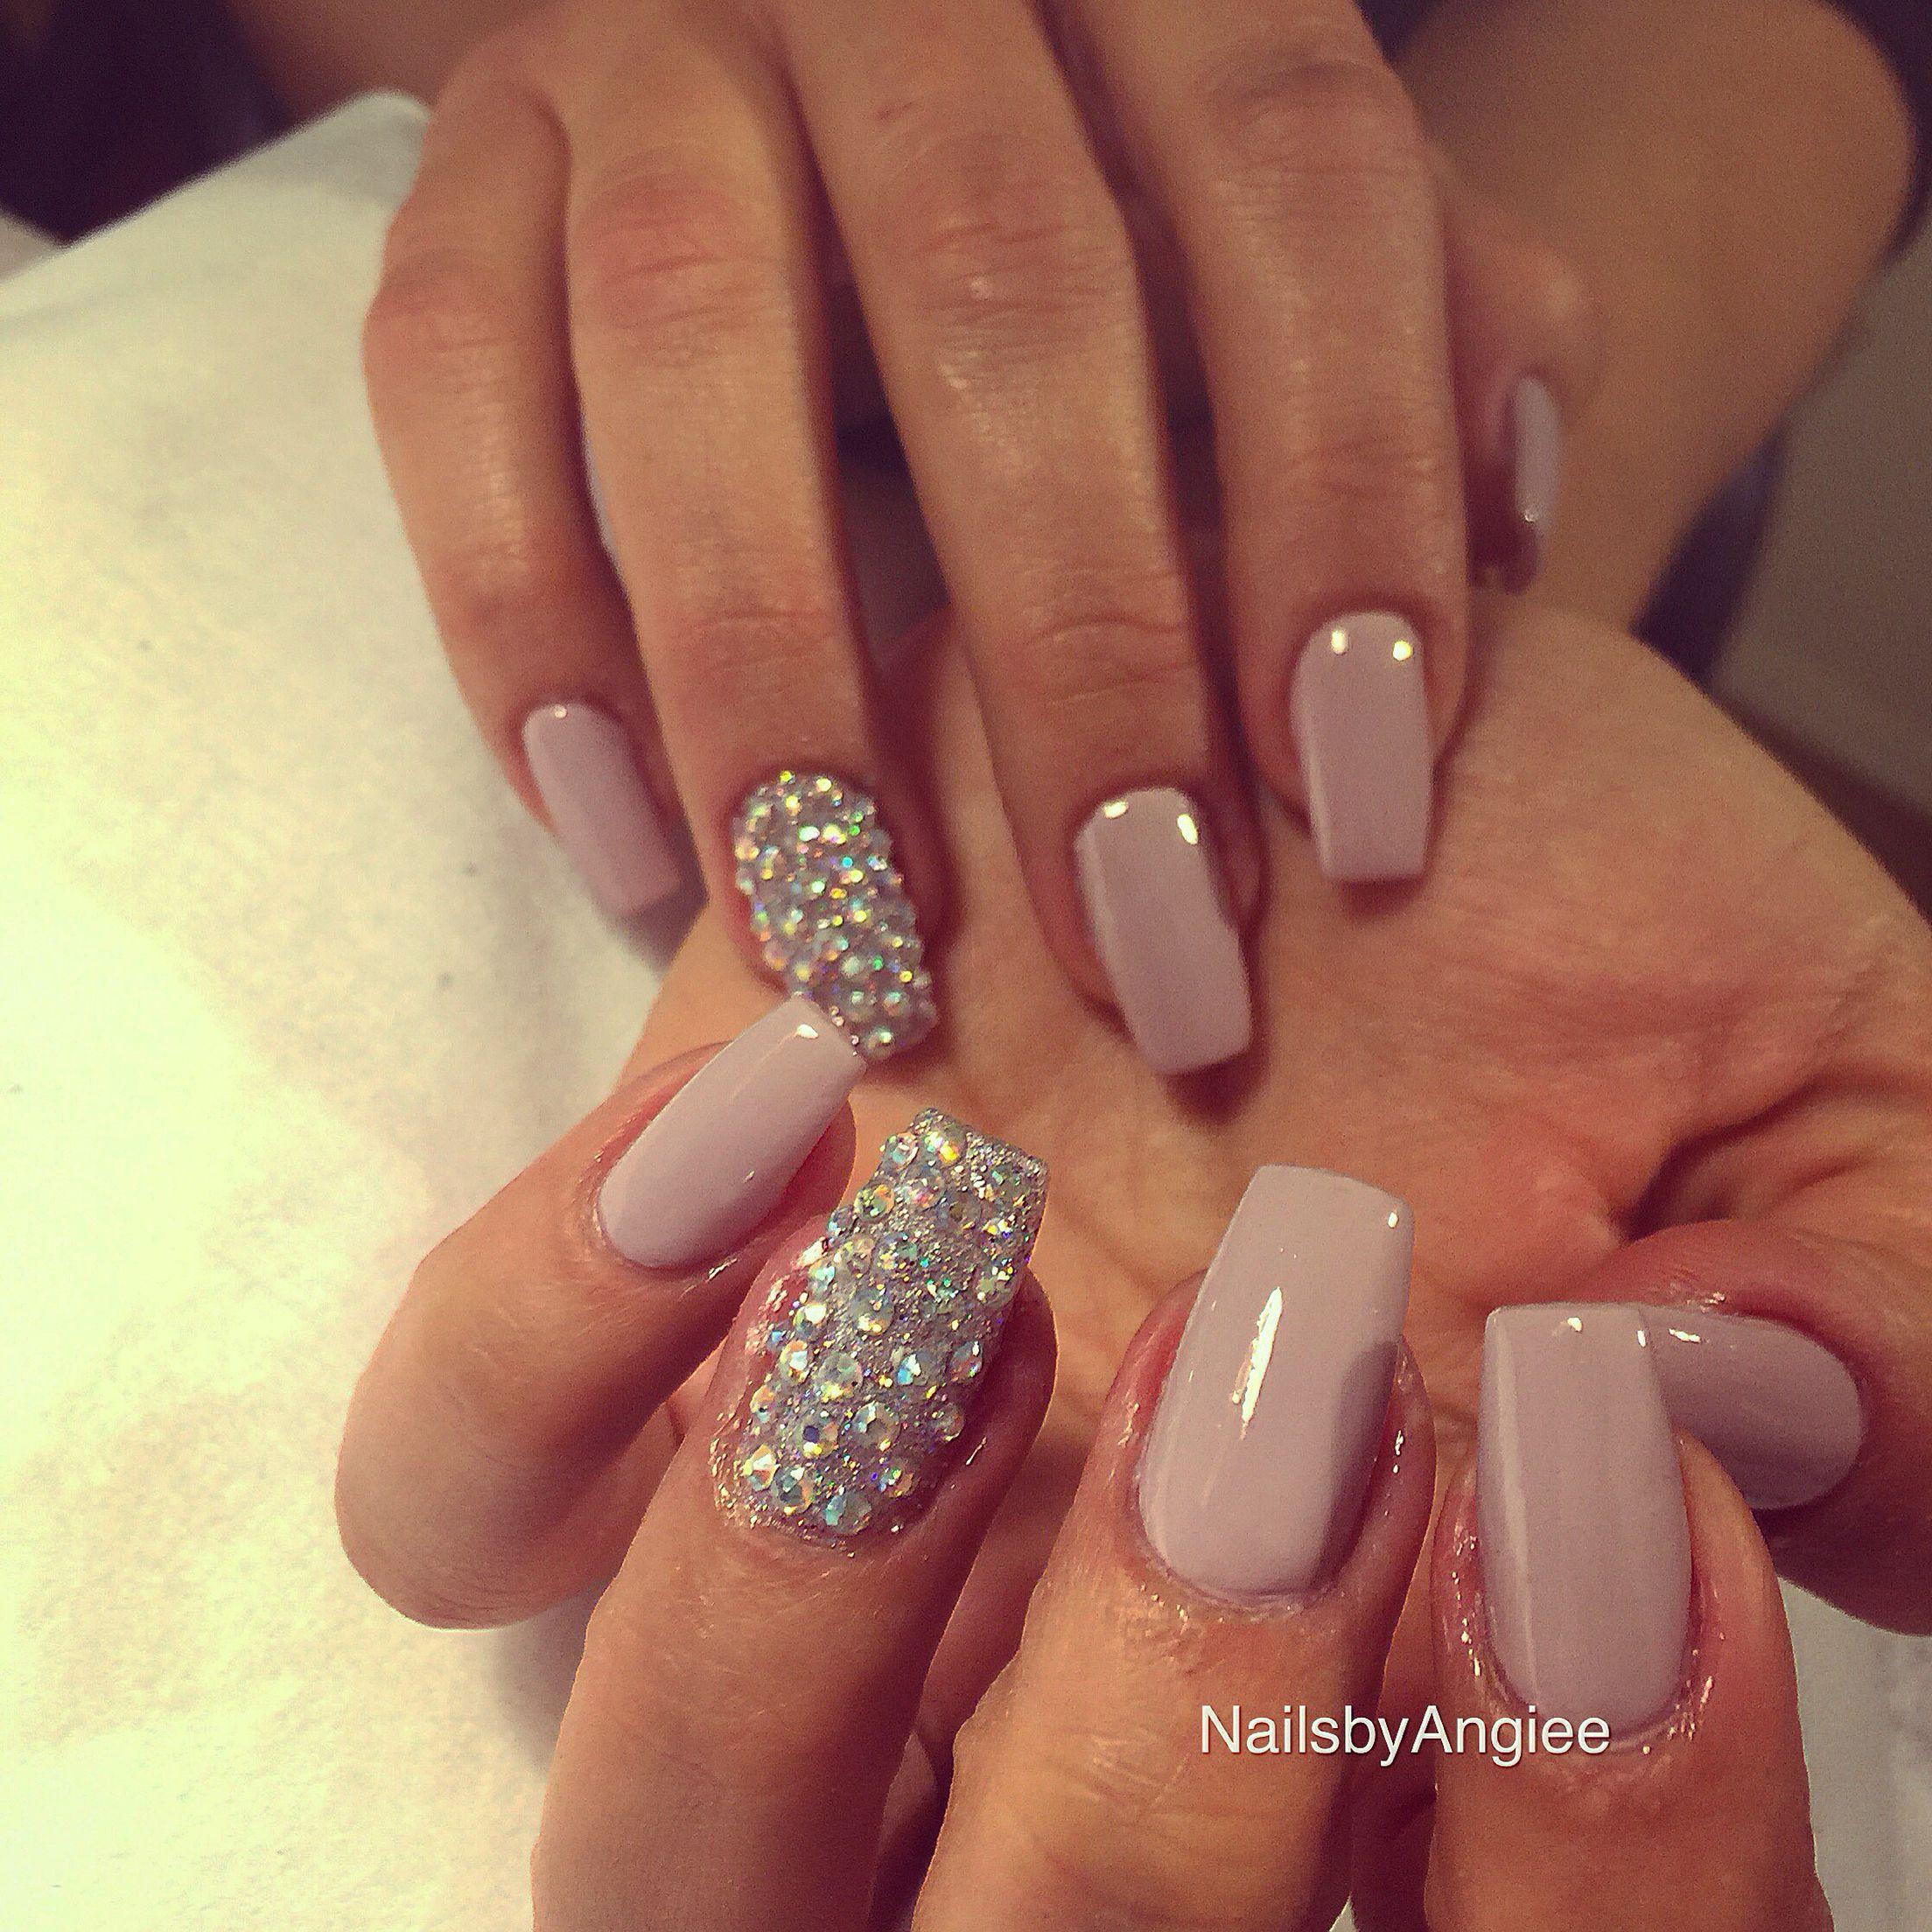 Nail polish set 2015